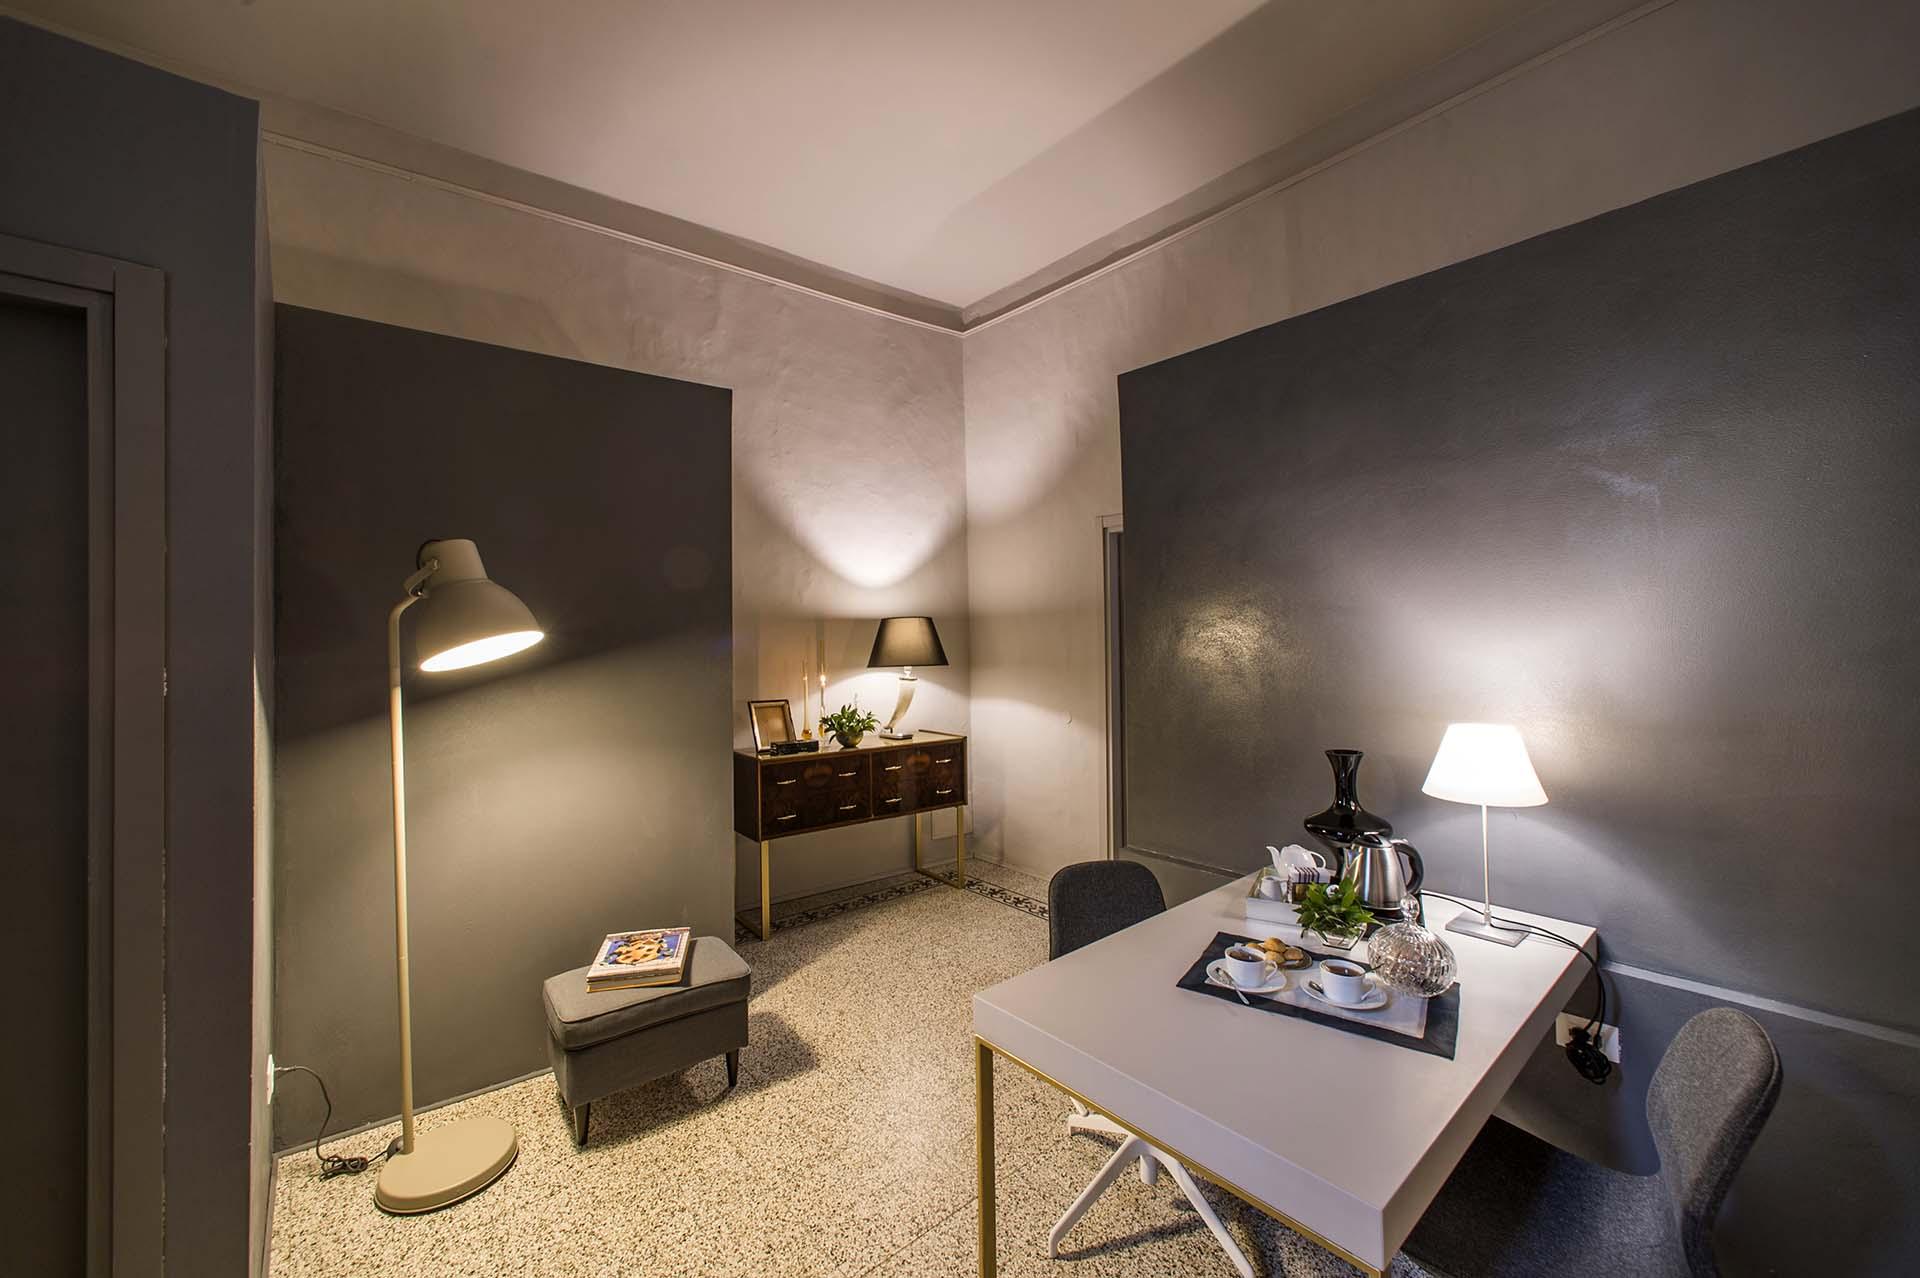 bB_palazzo_del_papa_siena_fullsize_commons